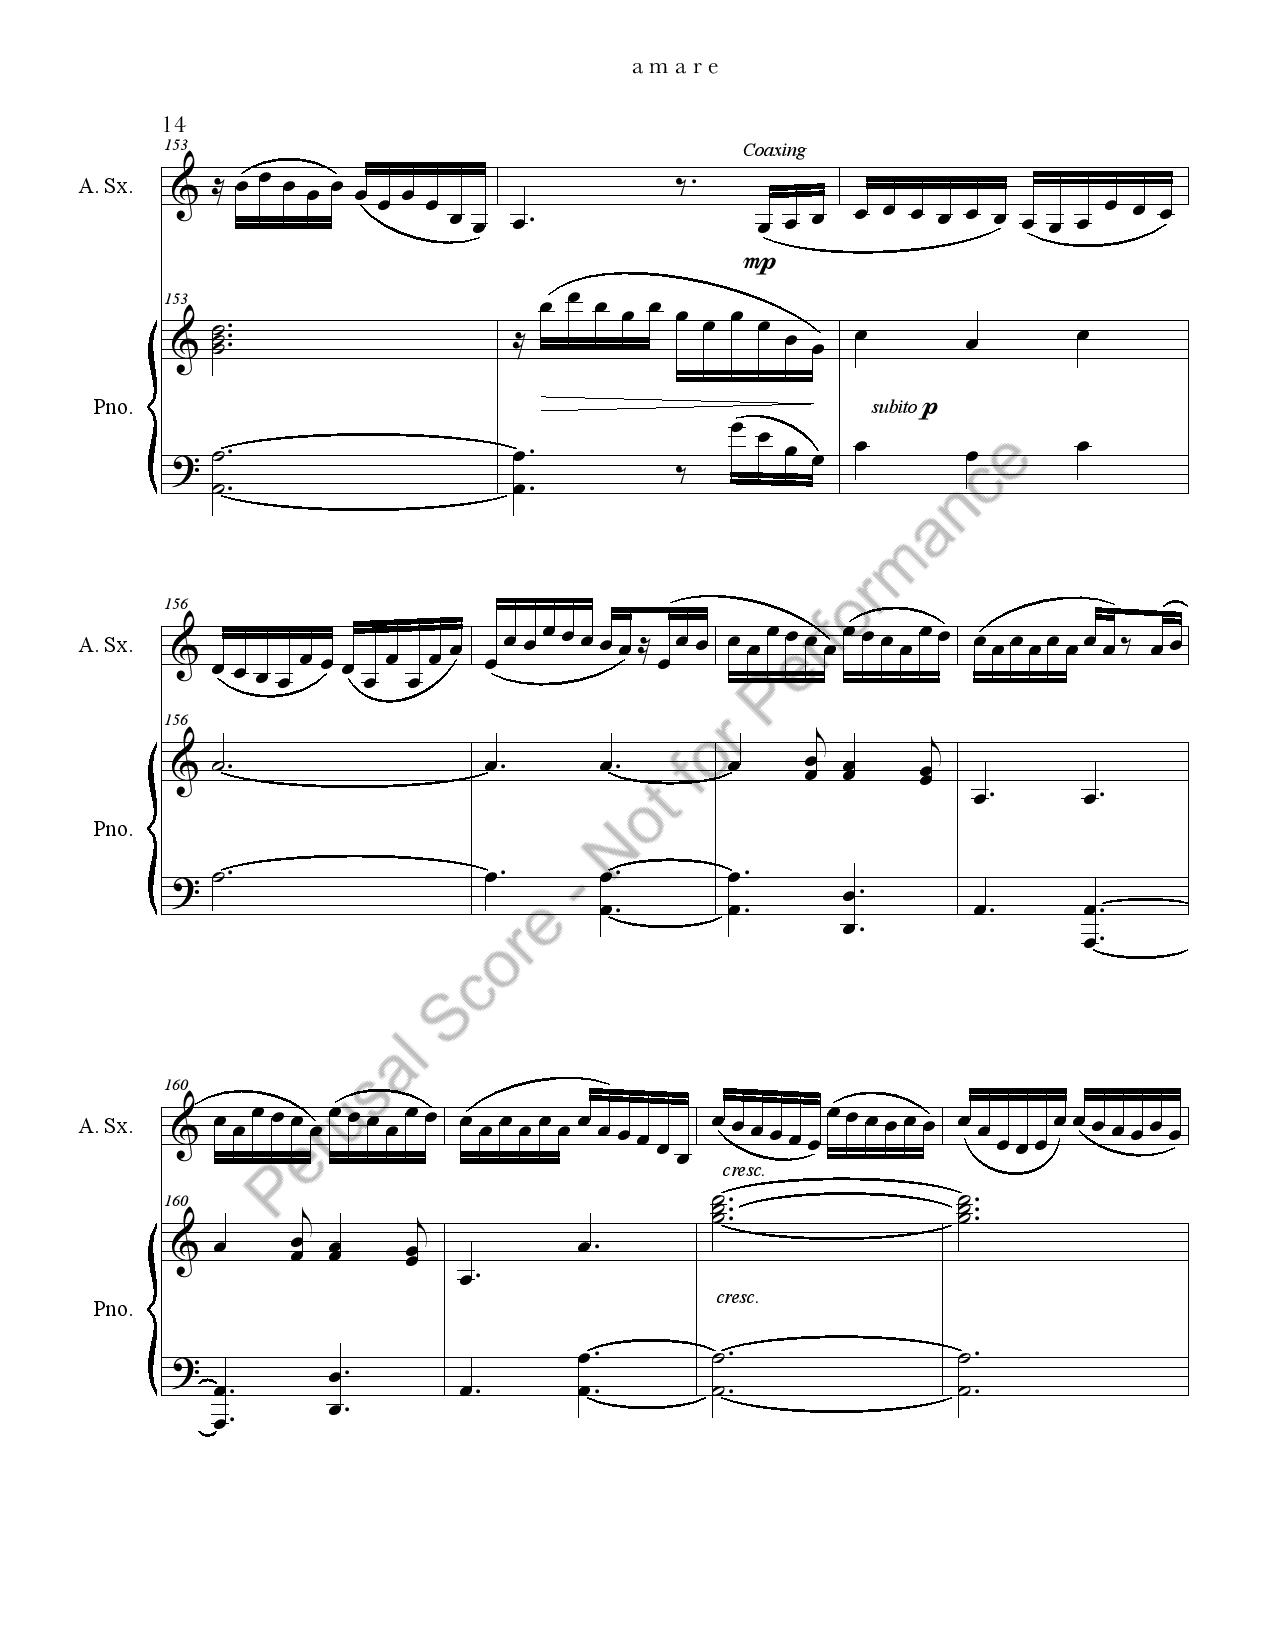 Boyd Amare Score_watermark-3-page-020.jpg